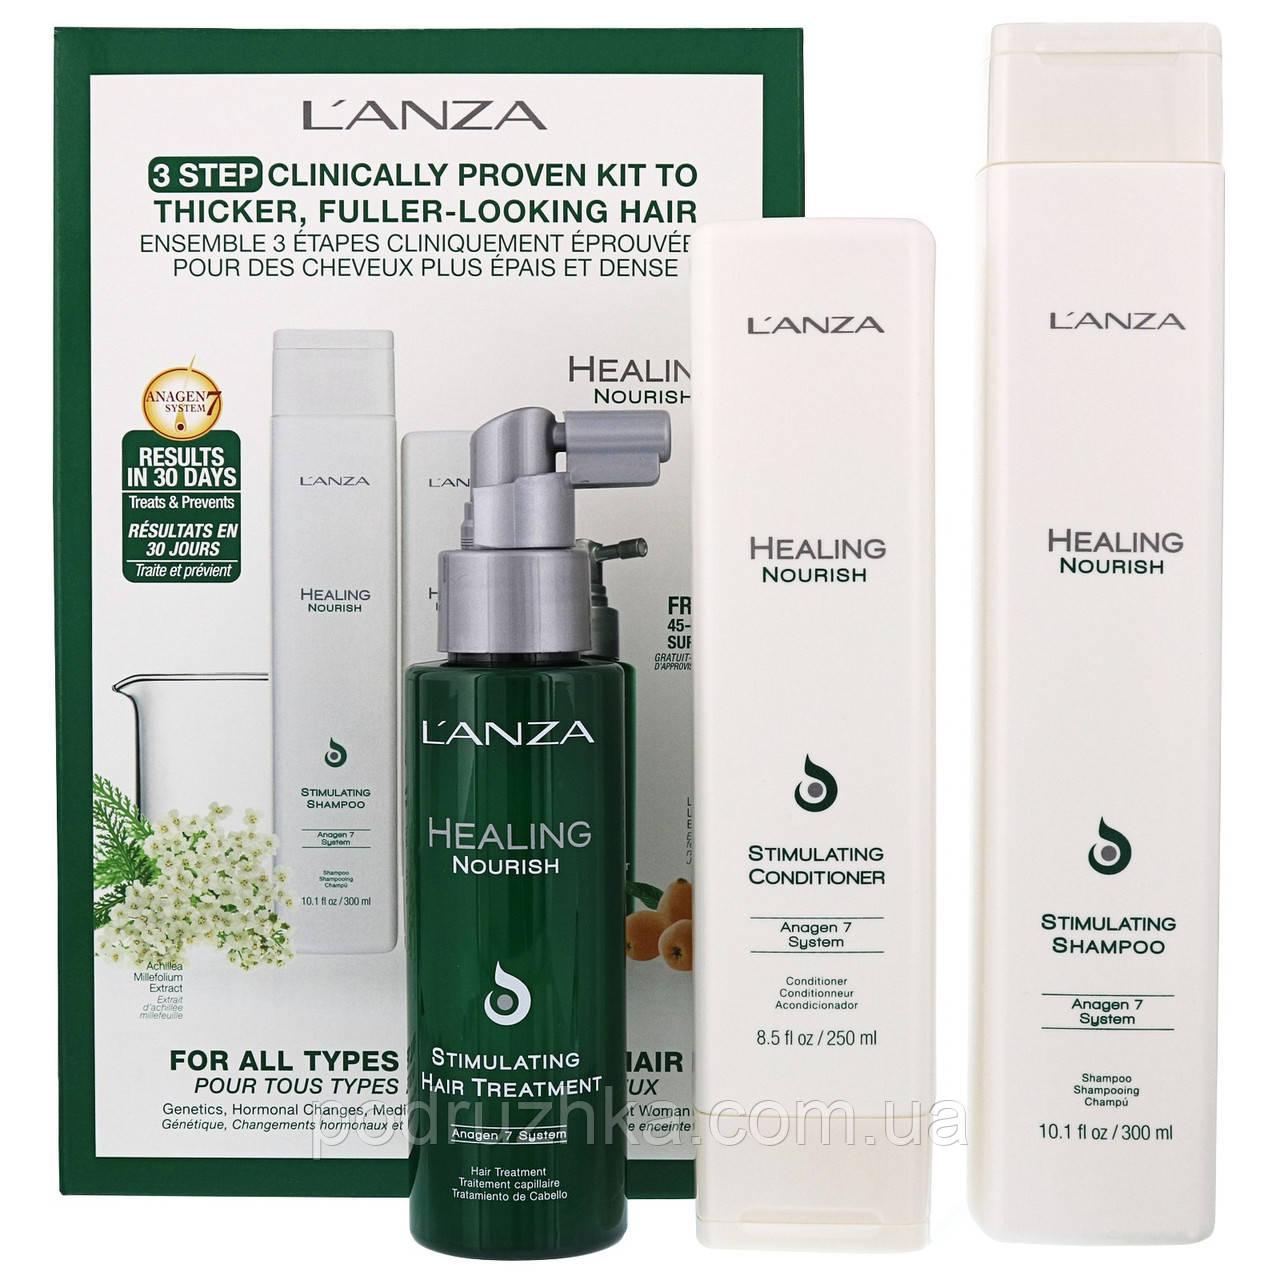 Lanza healing nourish real kit Набор для восстановления и стимуляции роста волос